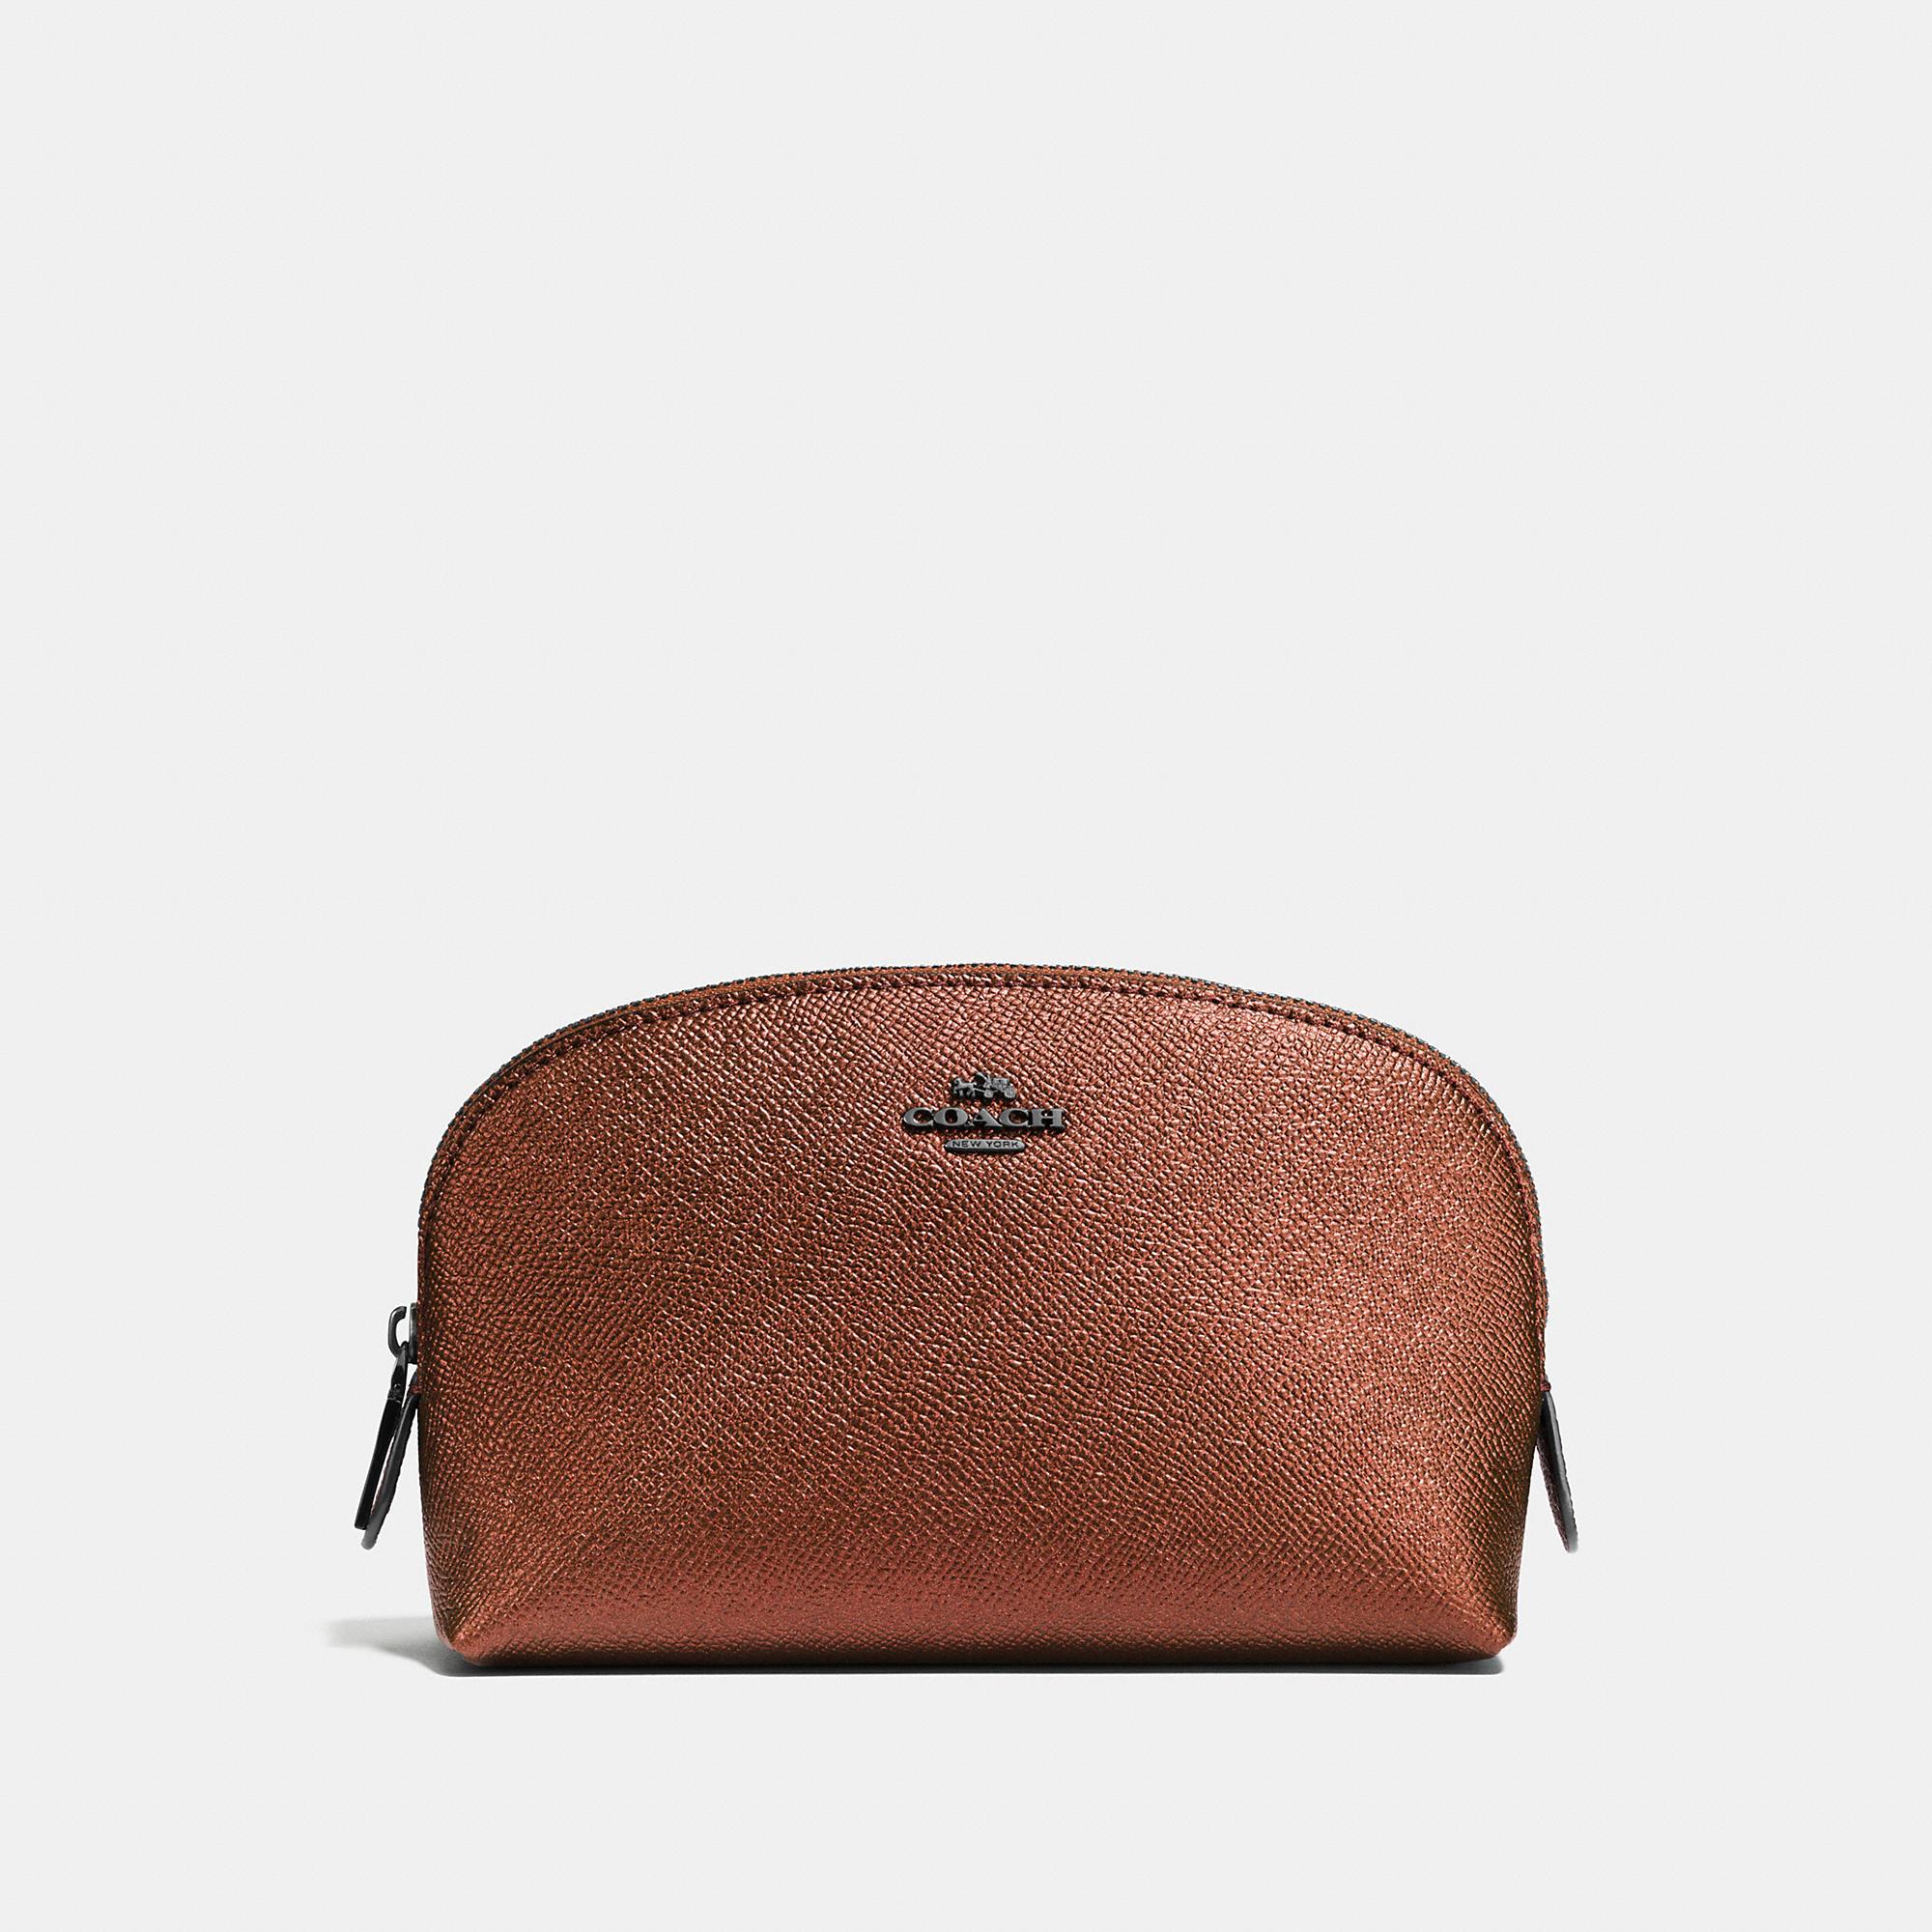 Coach Cosmetic Case 17 In Metallic Leather